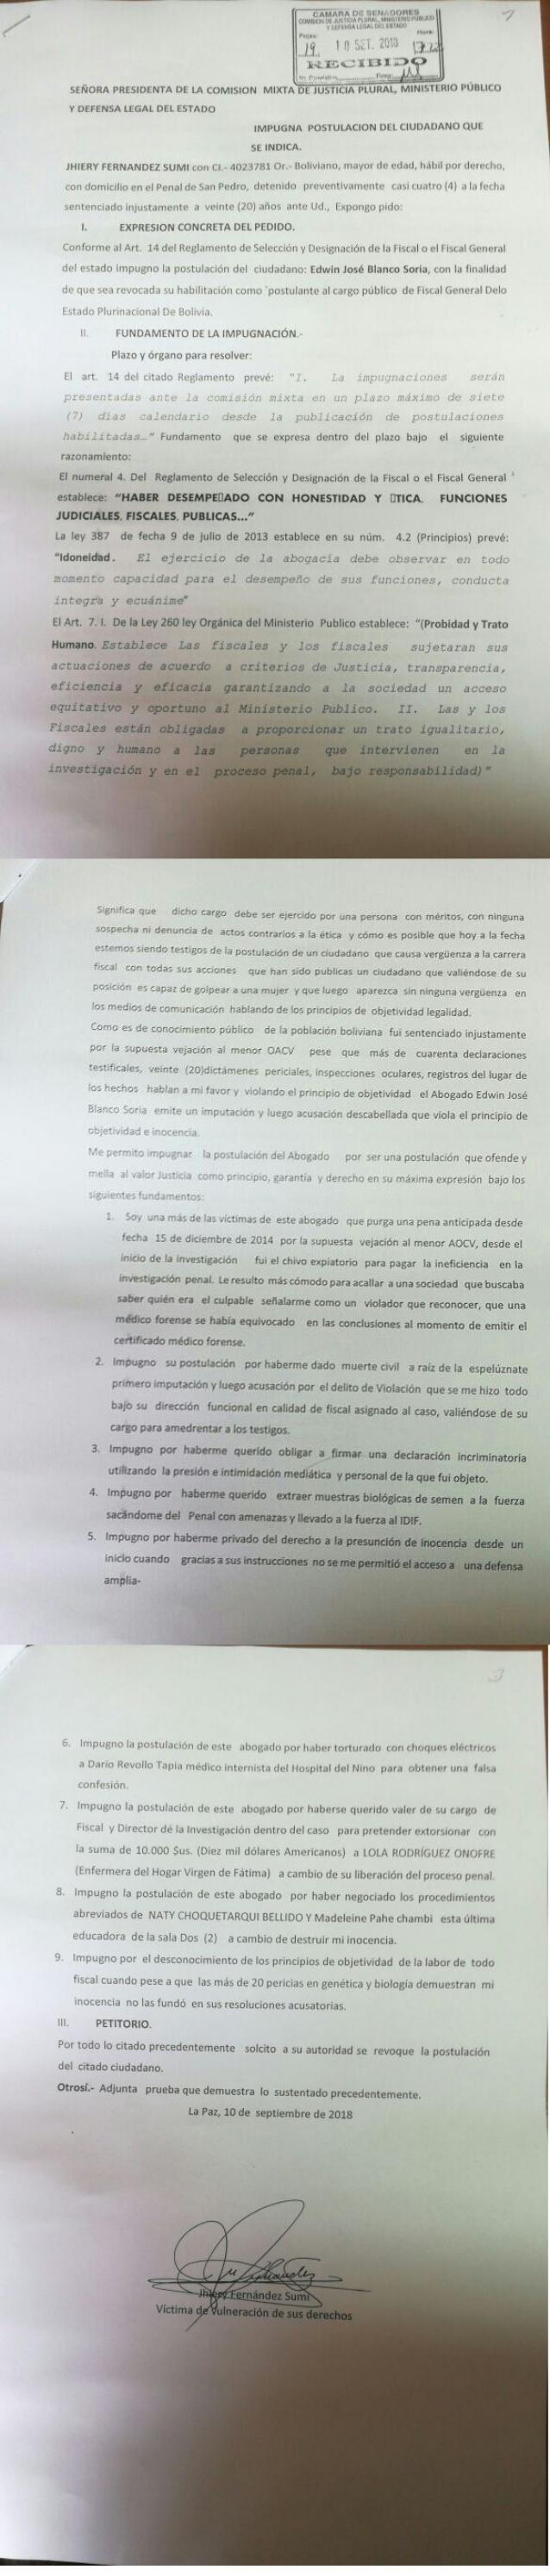 Caso Alexander impugnación a Edwin Blanco